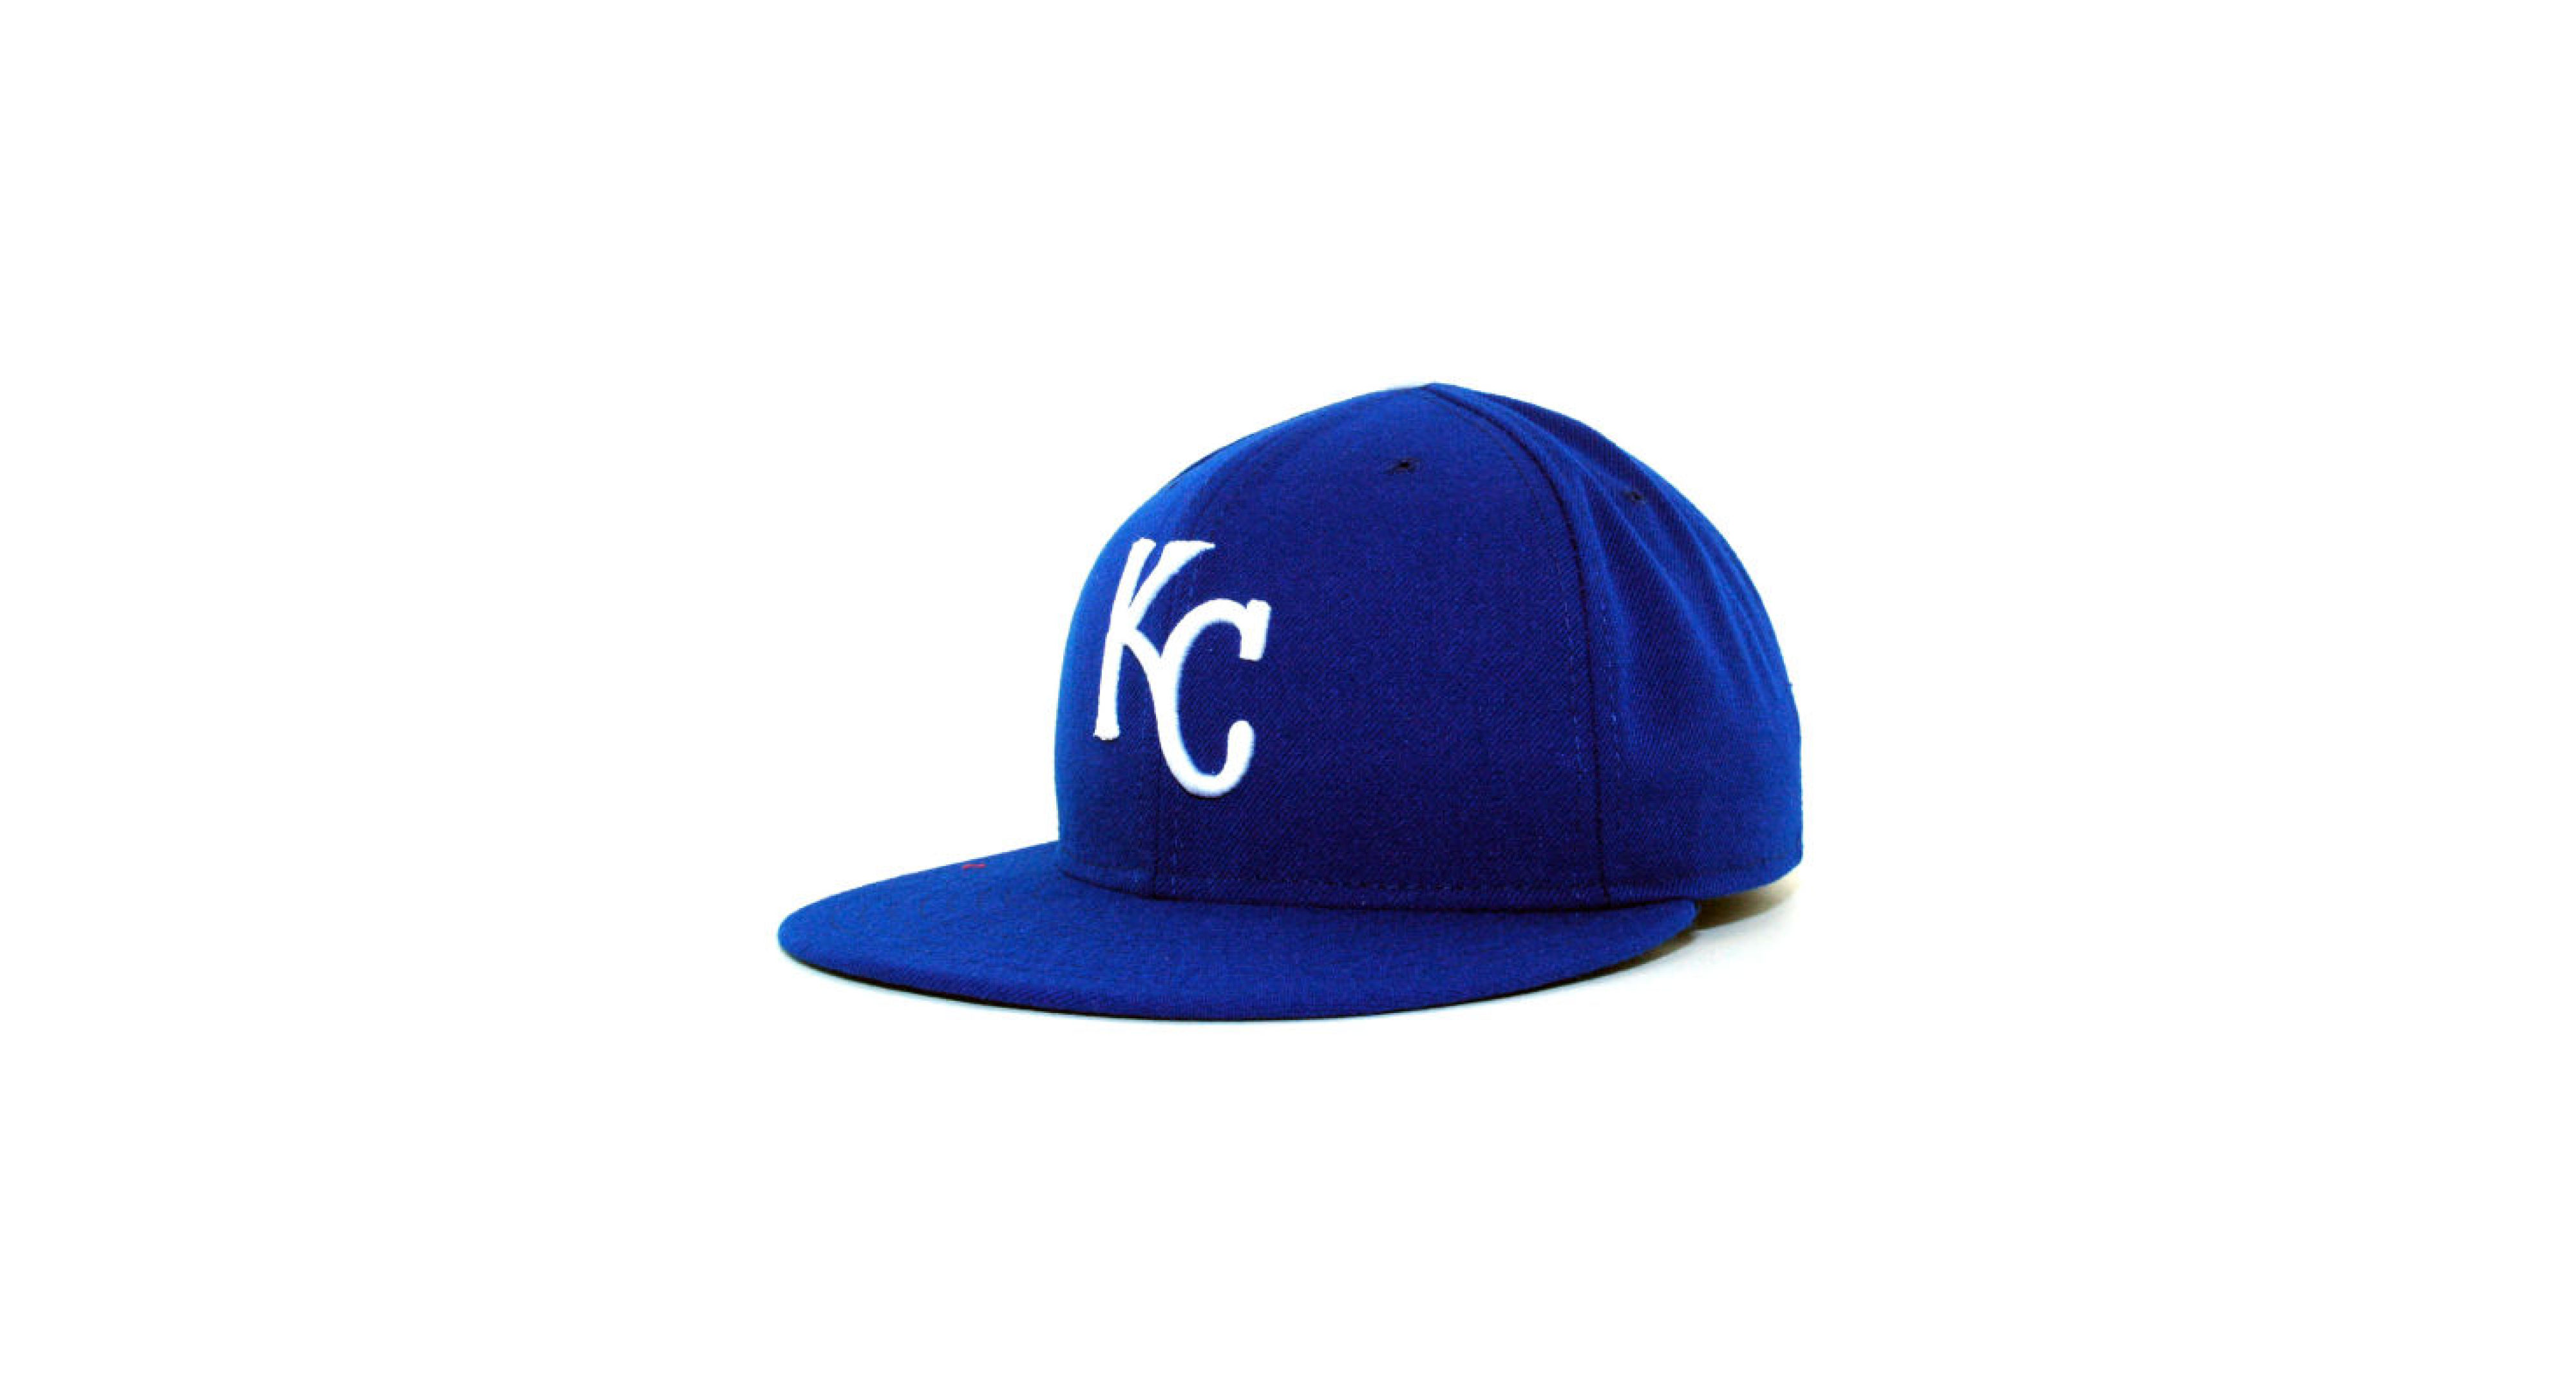 cef3a78b0fd New Era Kansas City Royals Mlb Authentic Collection 59FIFTY Cap ...